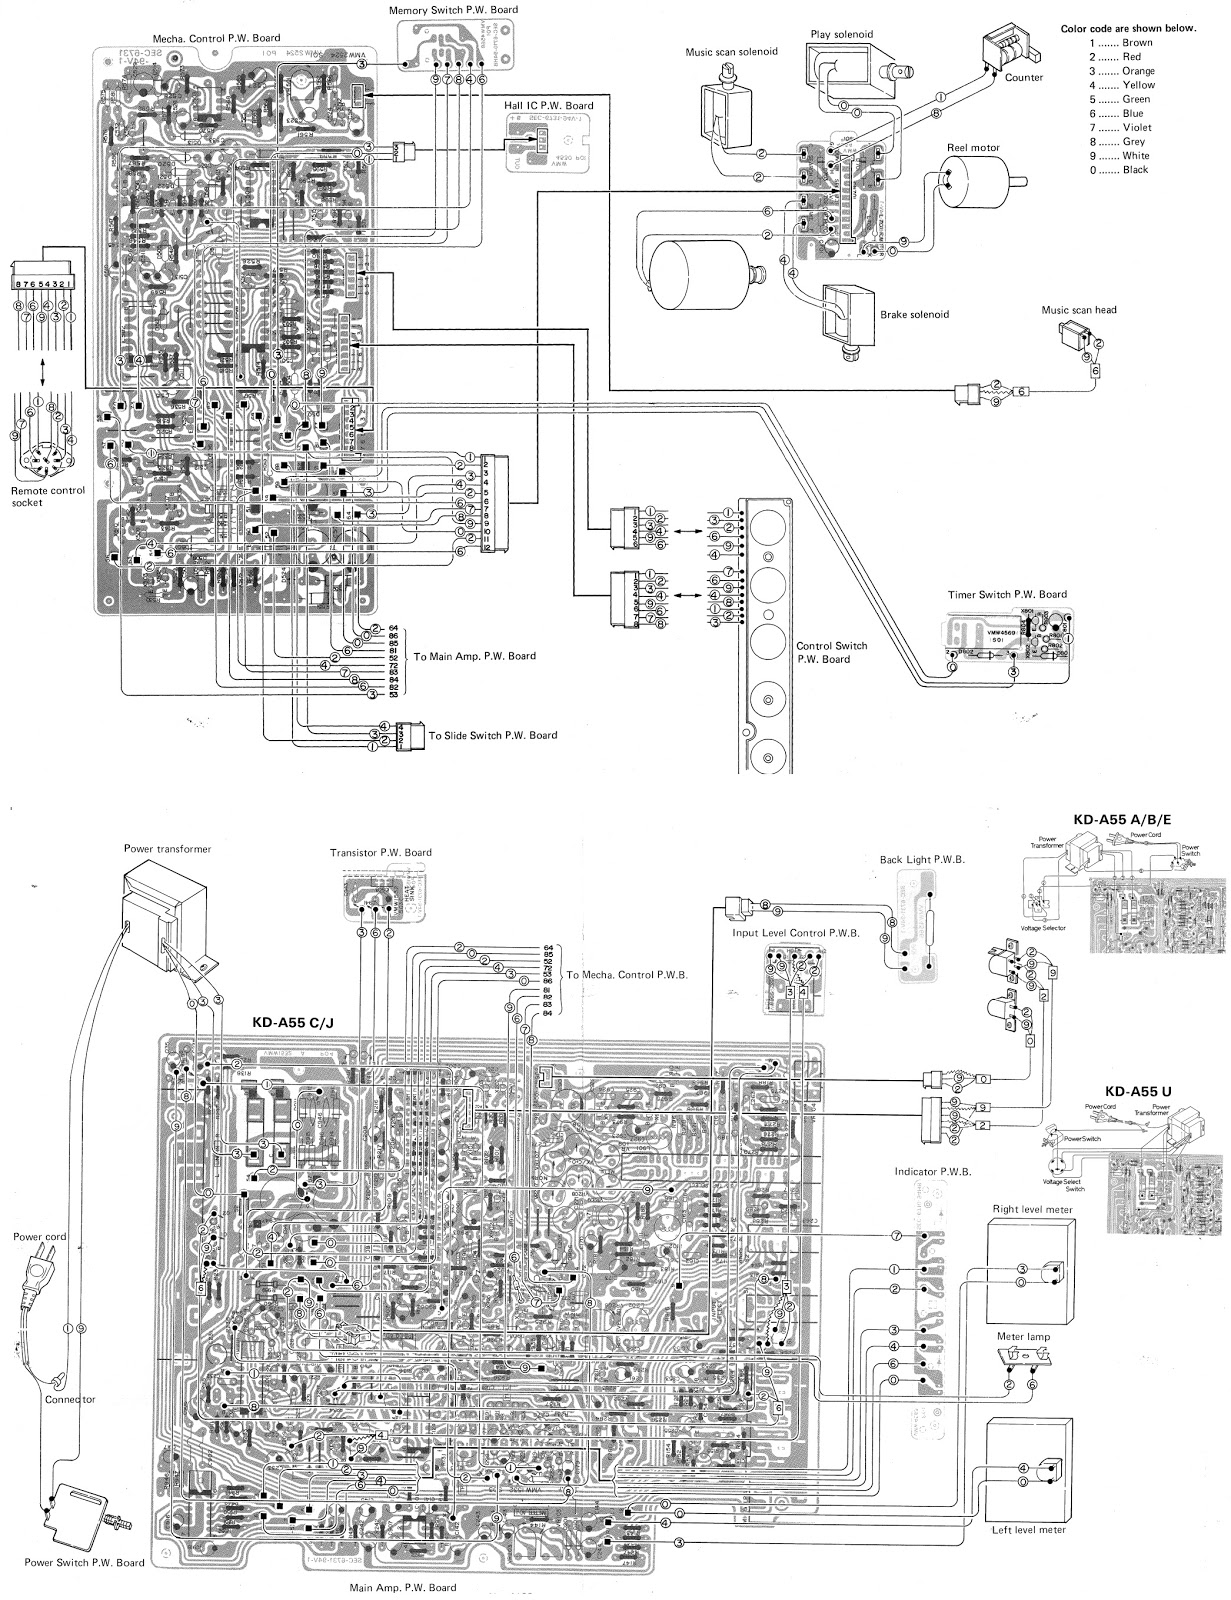 medium resolution of alpine ina w900 wiring diagram wiring diagram todays rh 3 18 10 1813weddingbarn com alpine ina